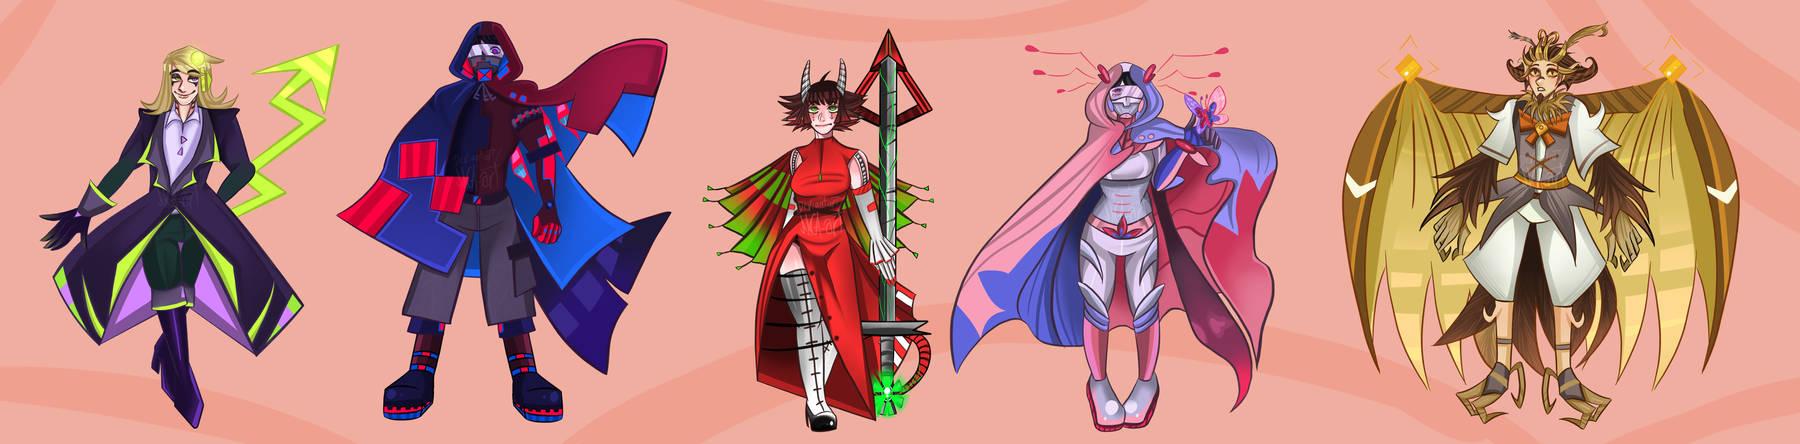 Hideaway characters 2/3